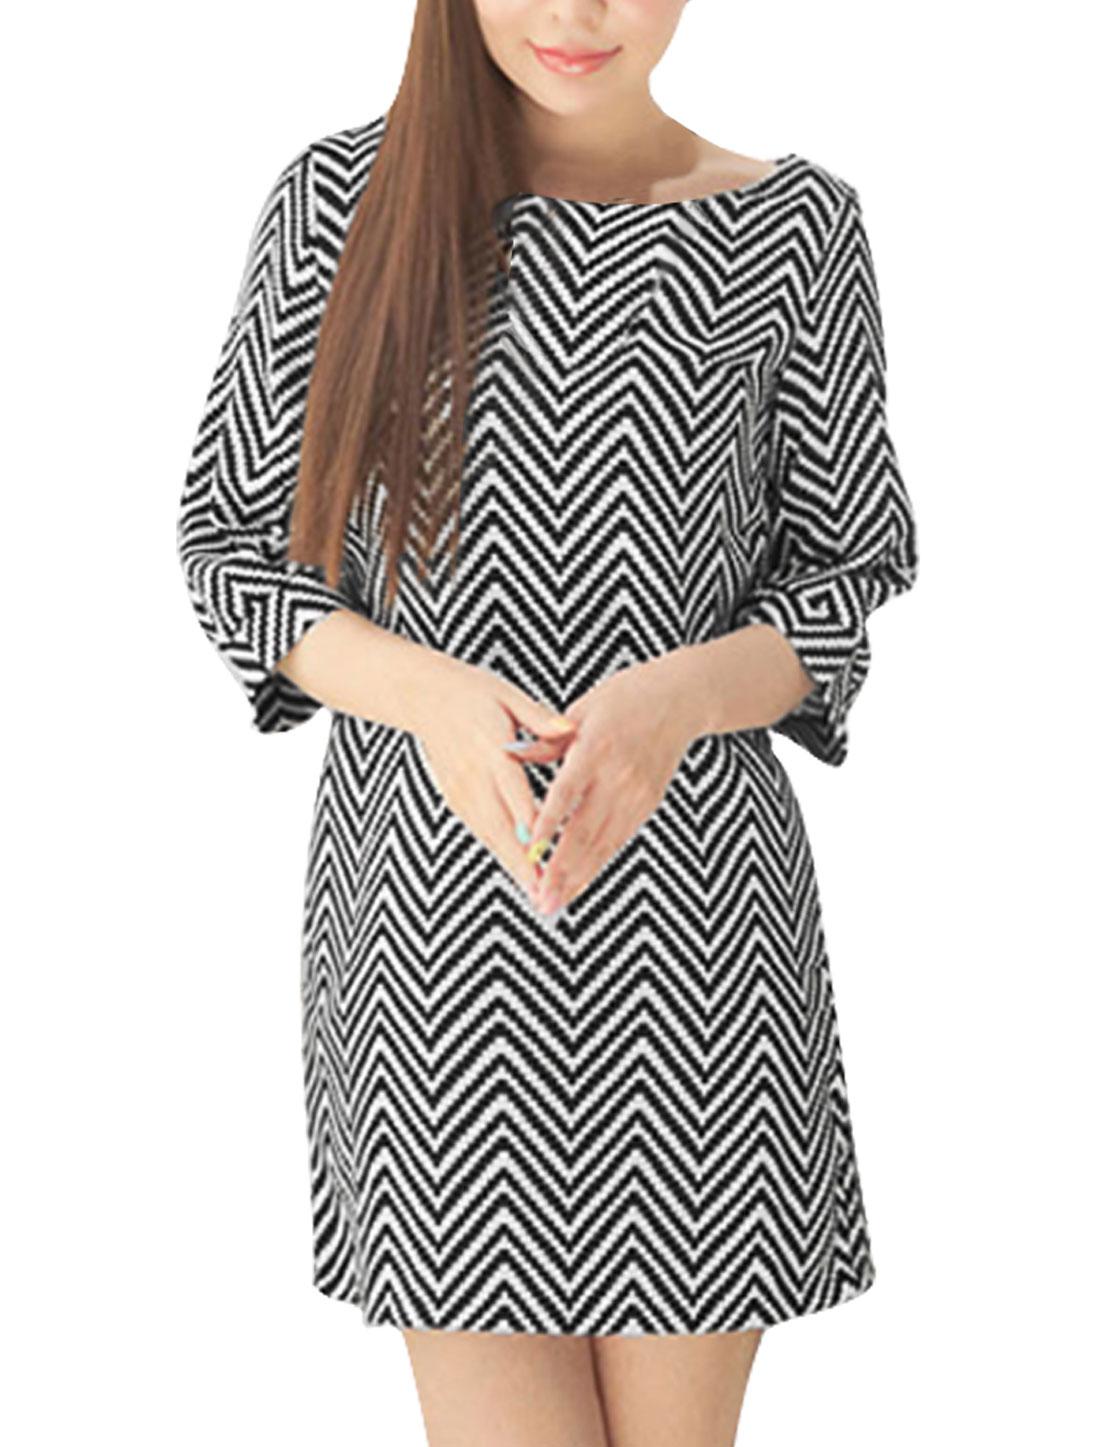 3/4 Sleeved Concealed Back Zip Zig-zag Black White Dress Women S